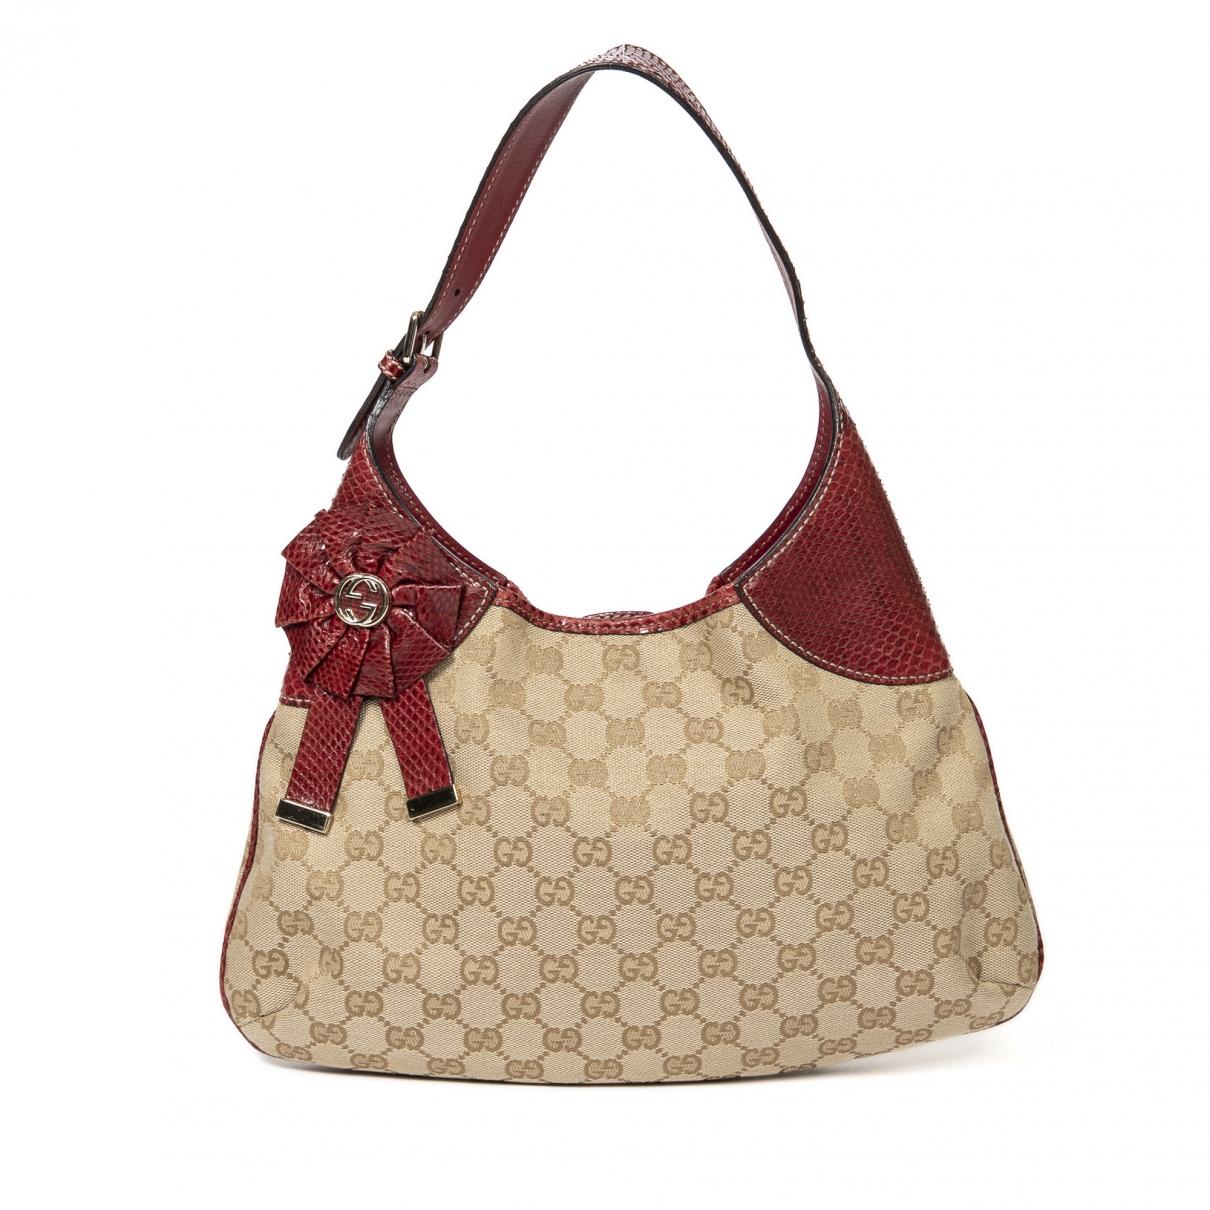 Gucci Hobo Handtasche in Baumwolle